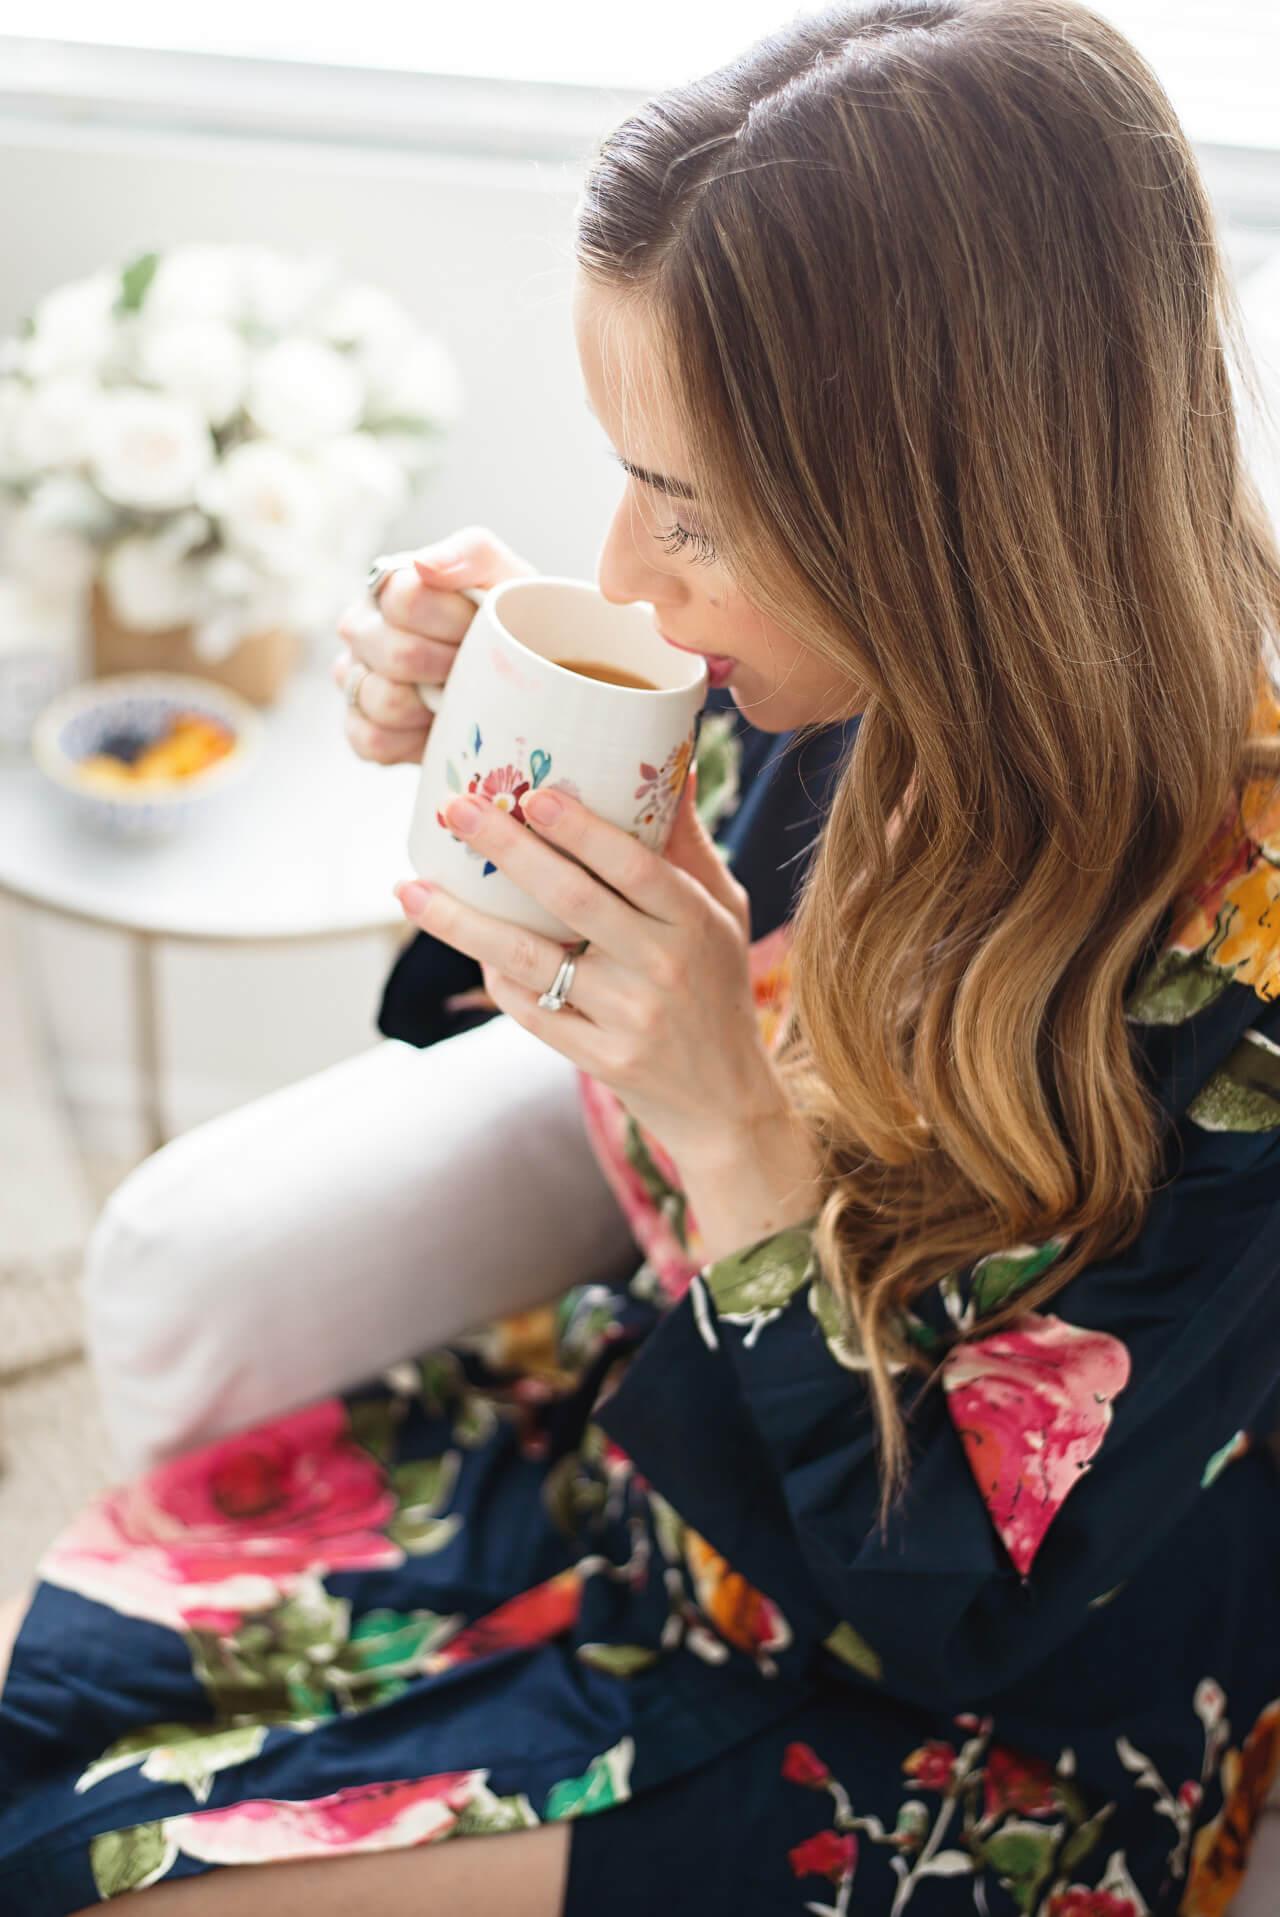 drinking_coffee_in_morning